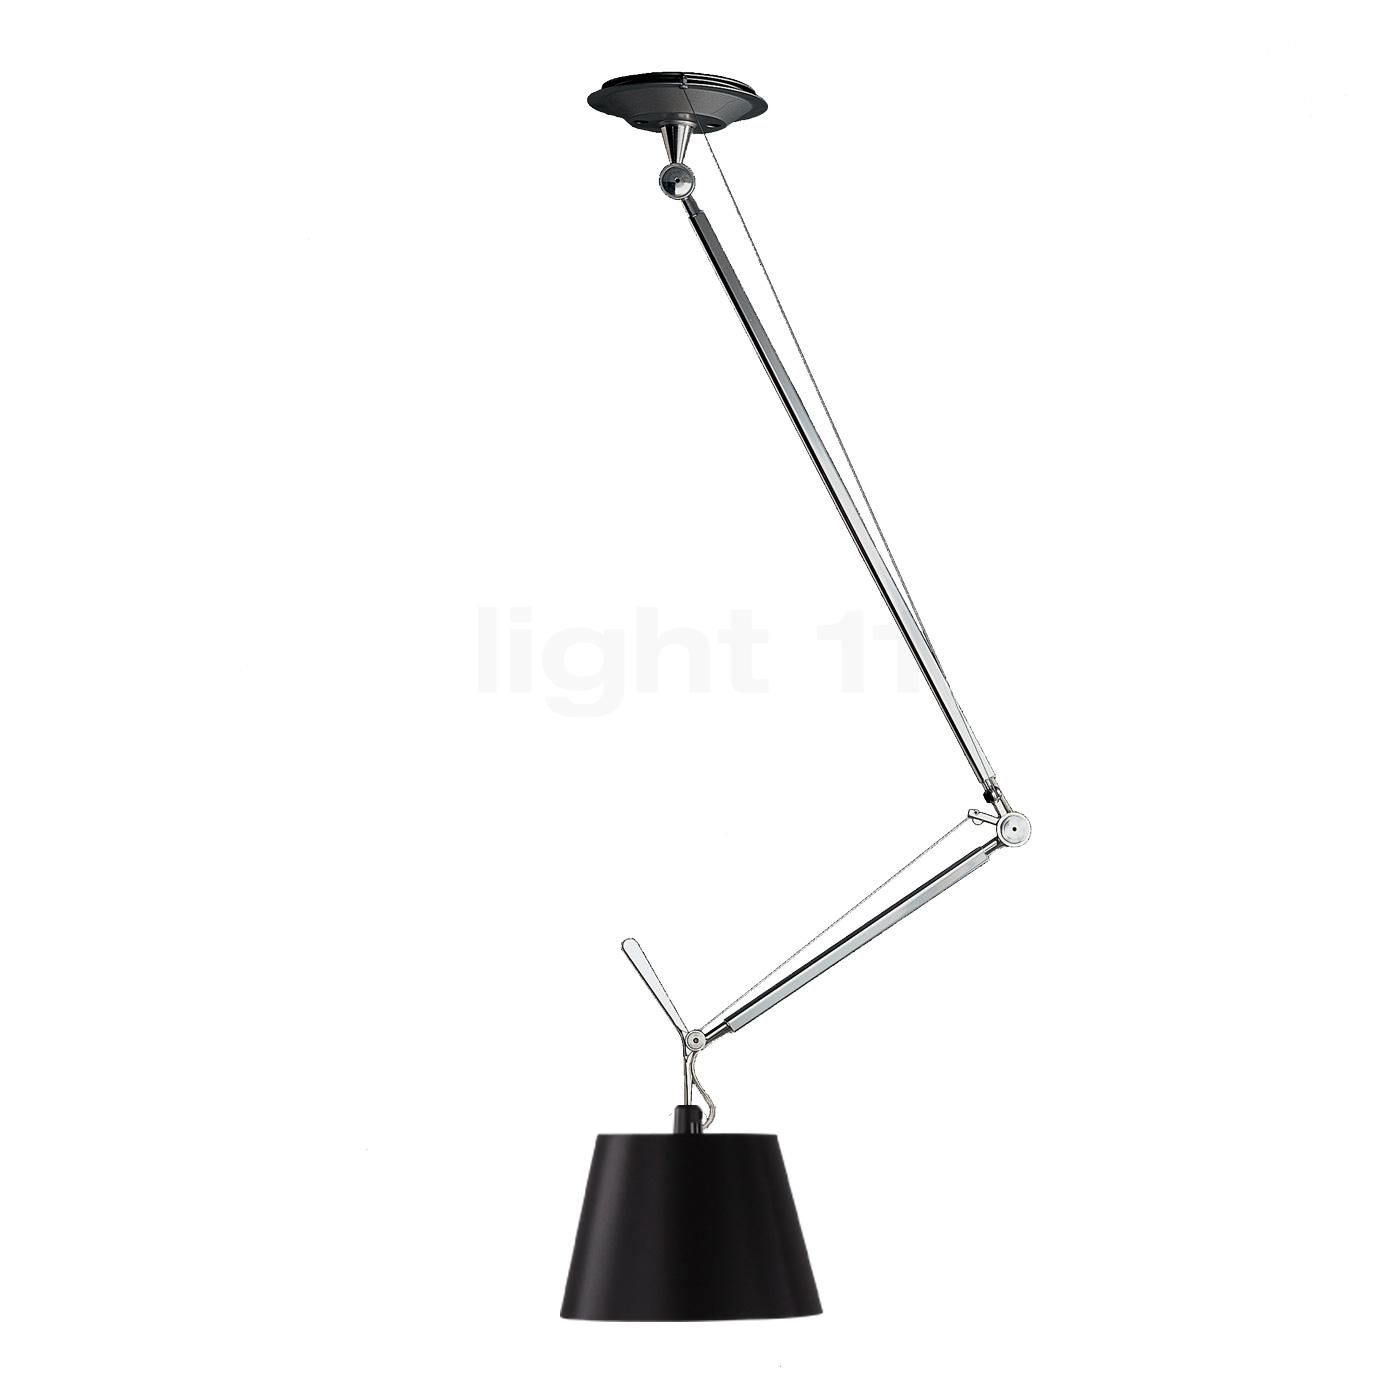 Buy Artemide Tolomeo Sospensione Decentrata Black Edition At Interior Lighting Lamp Lights